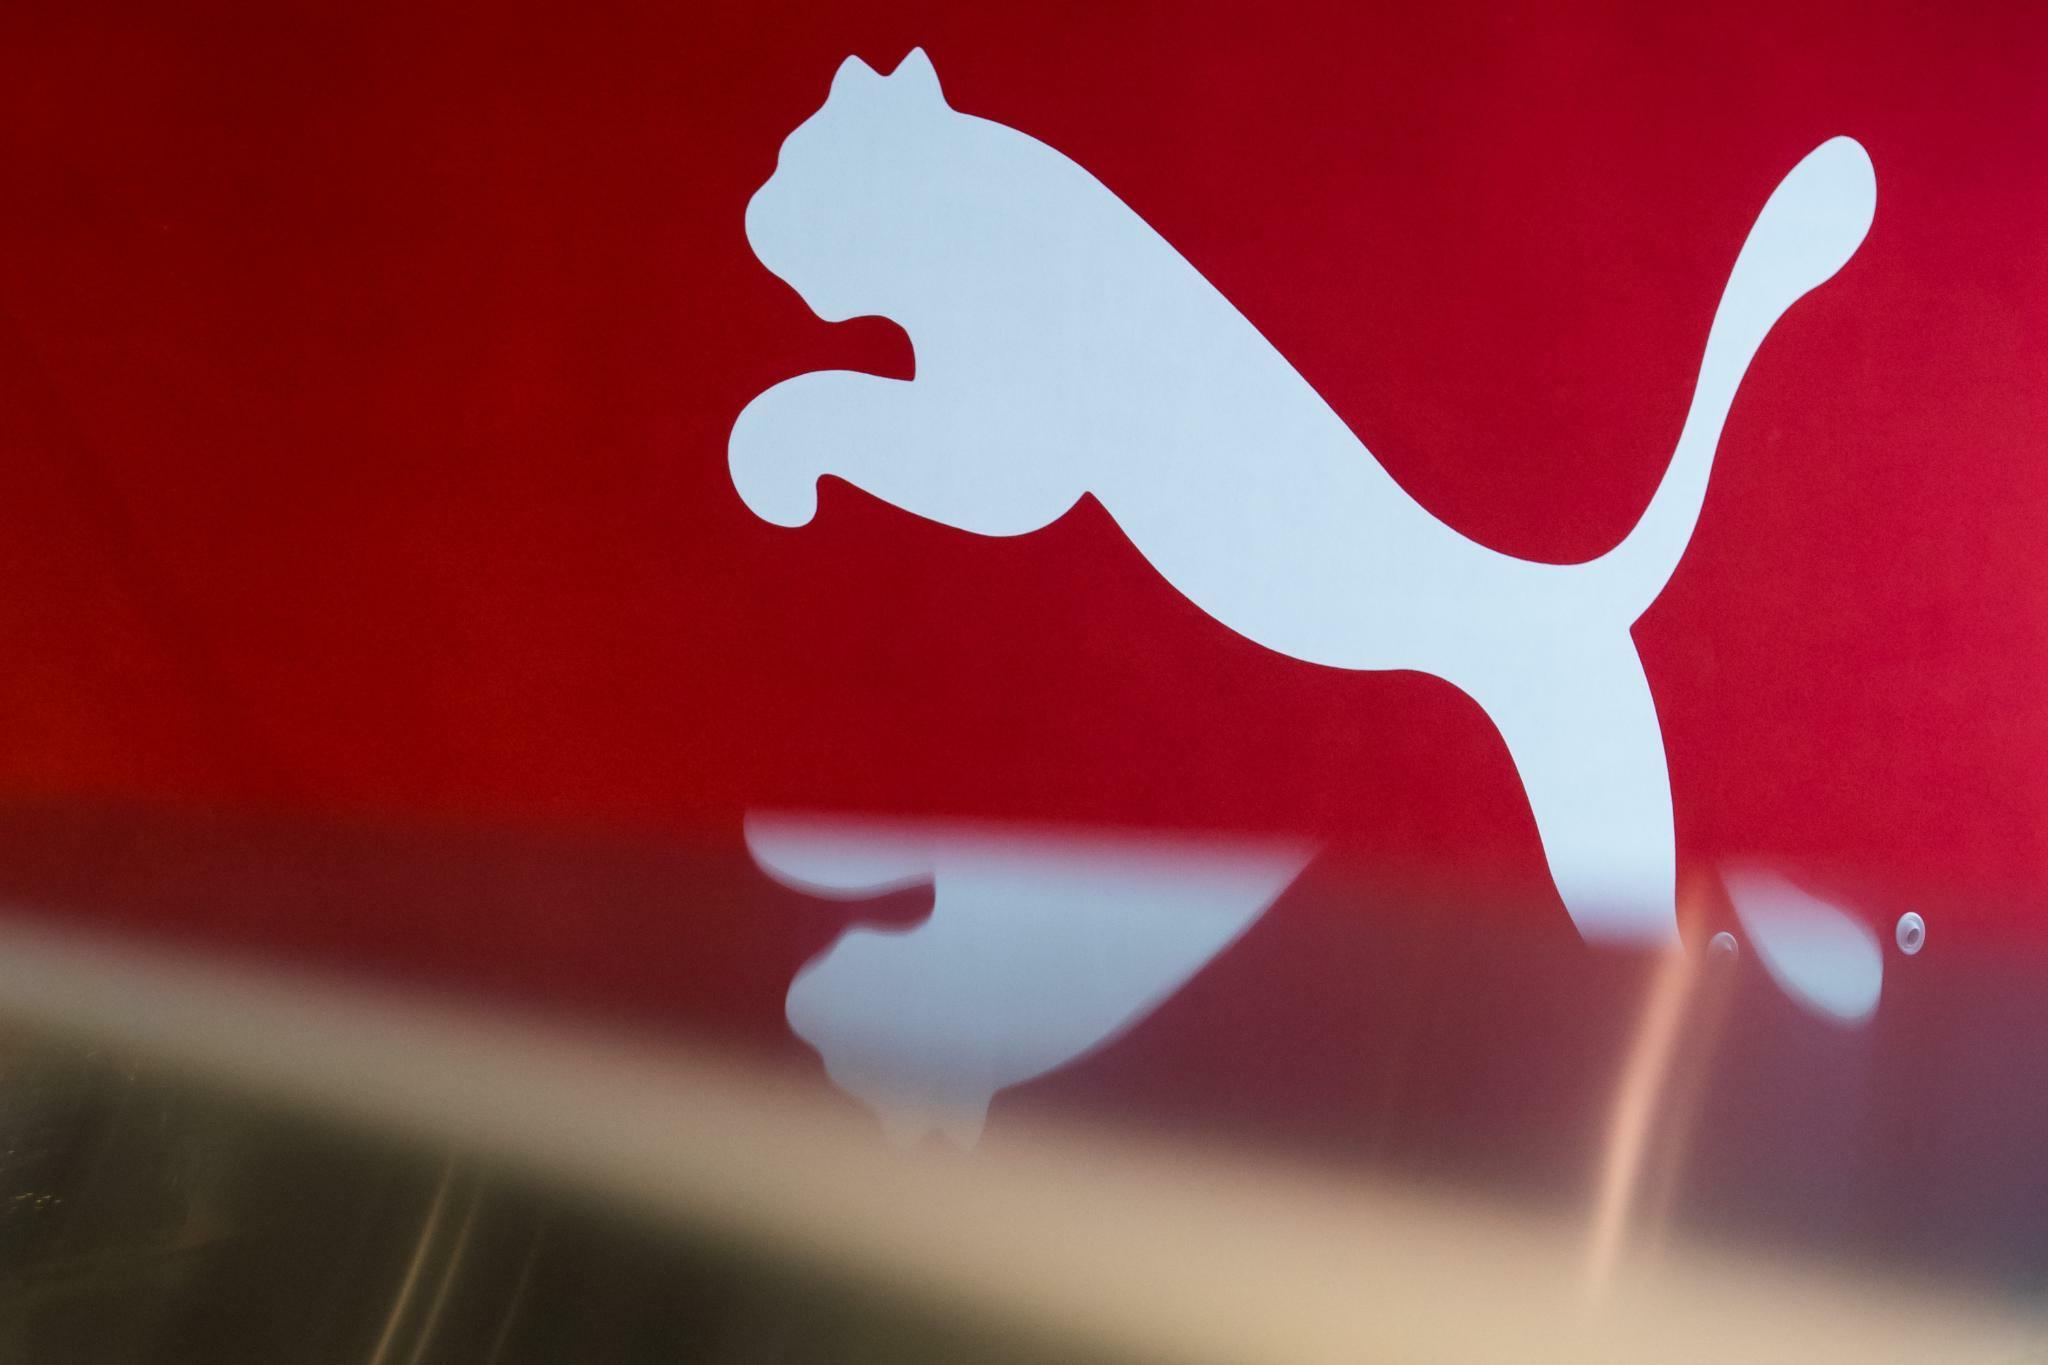 Puma (Sportartikelhersteller) – Wikipedia